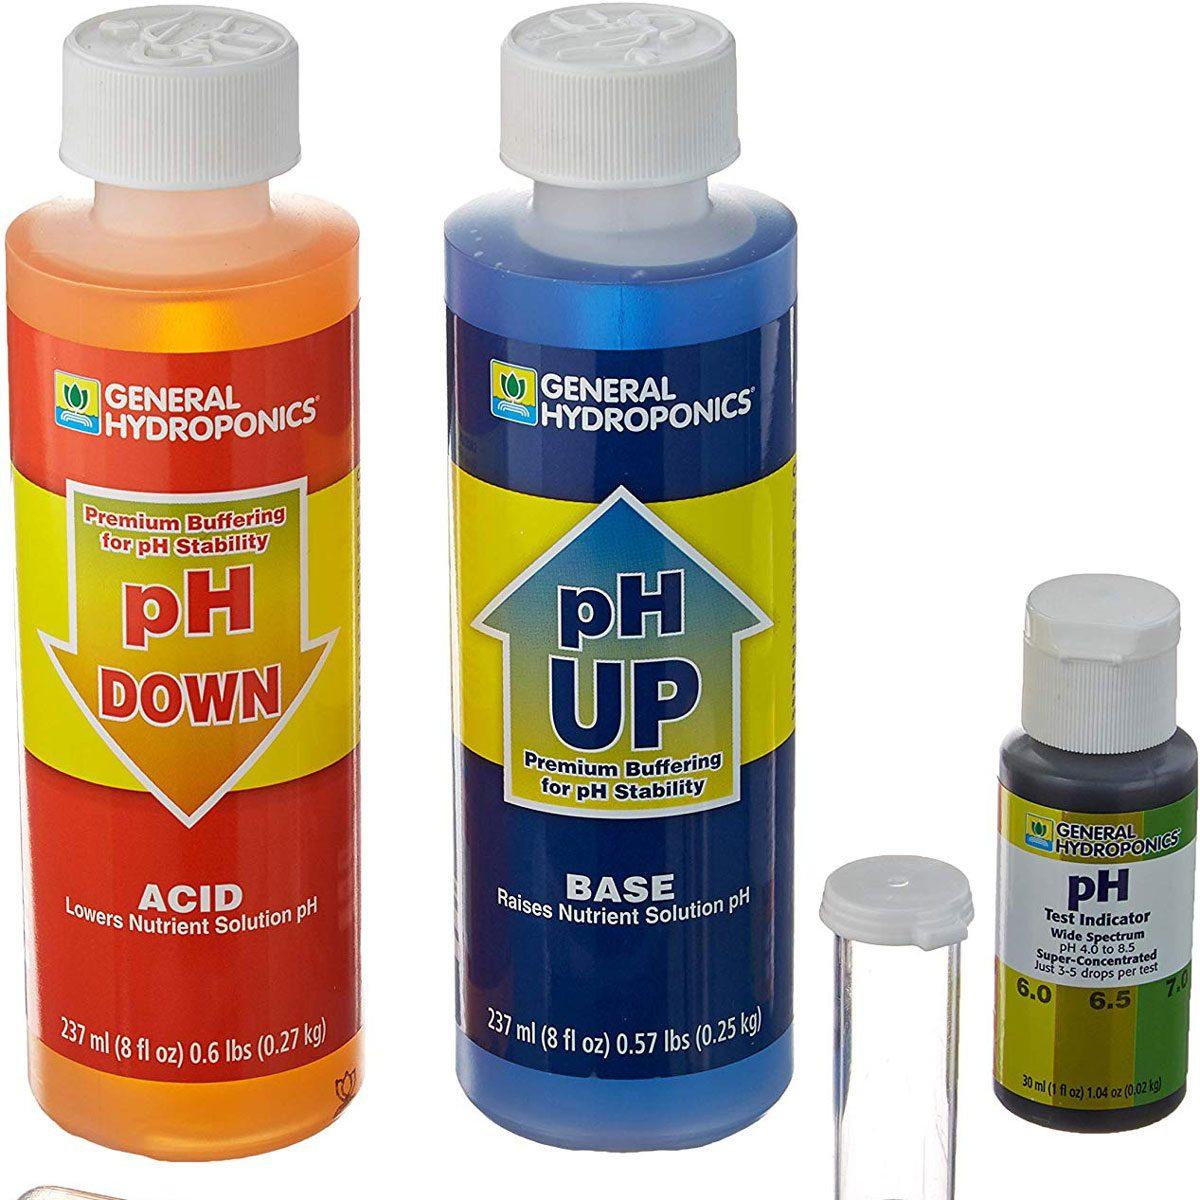 Soil pH adjustment supplies